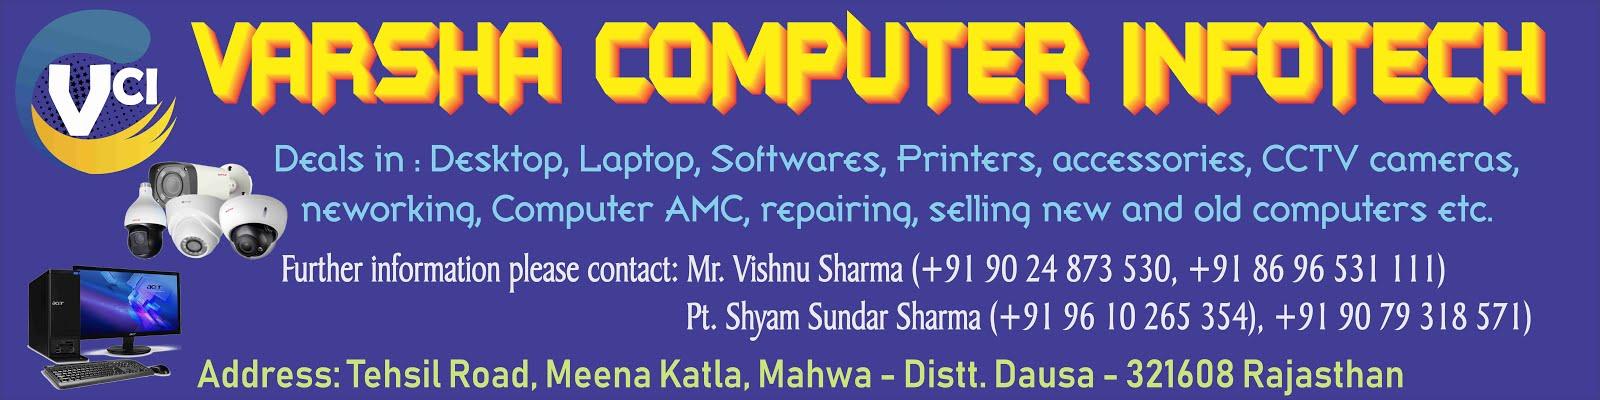 VARSHA COMPUTERS